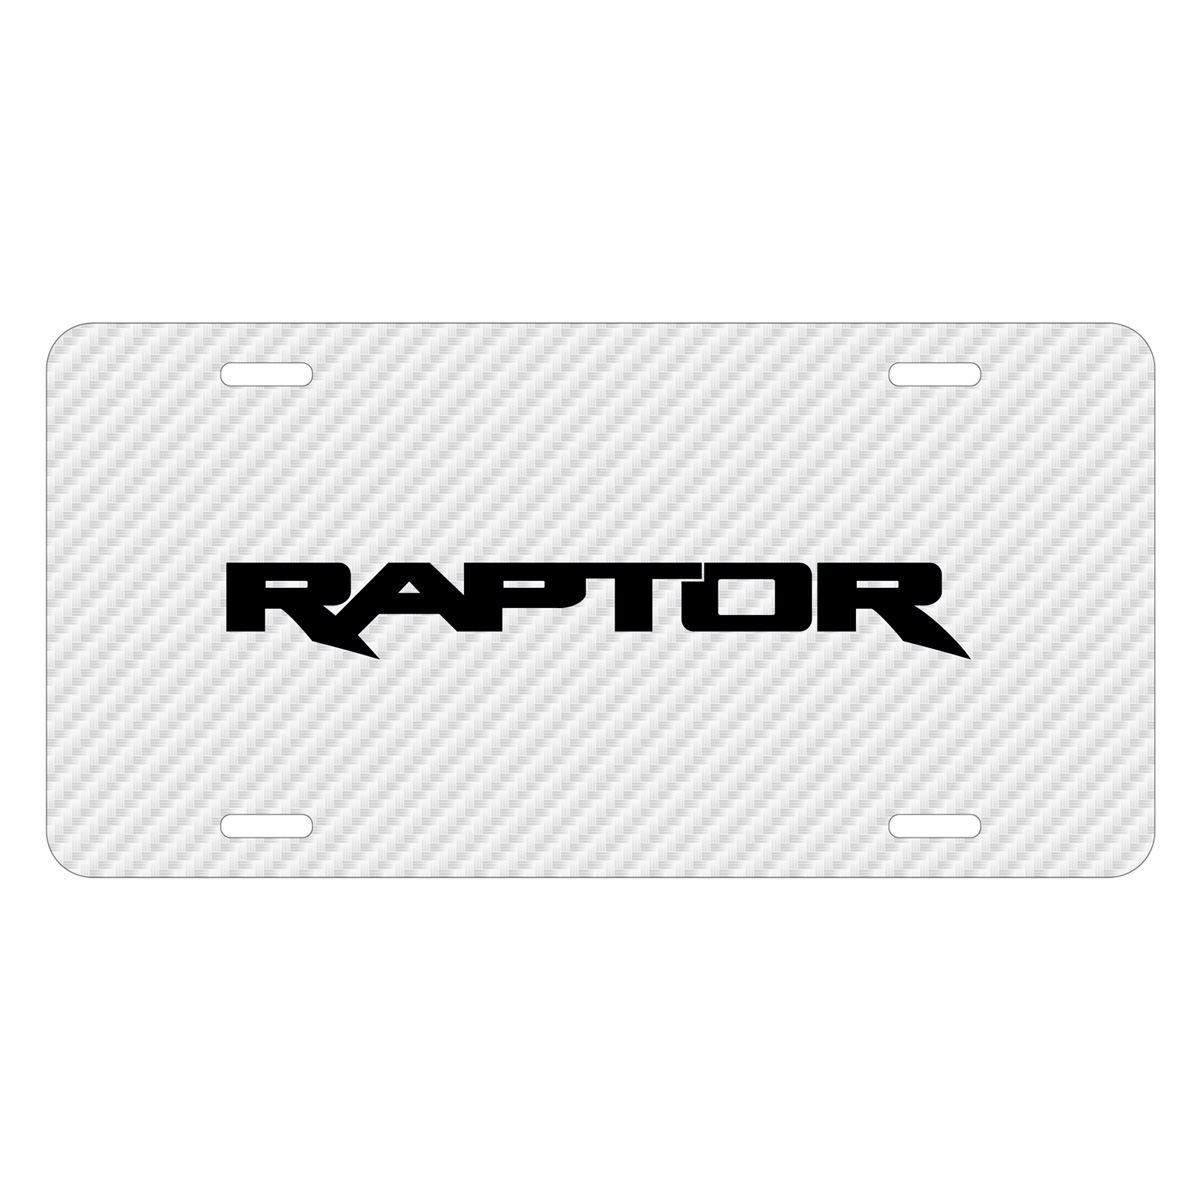 Ford F-150 Raptor 2017 White Carbon Fiber Texture Graphic UV Metal License Plate